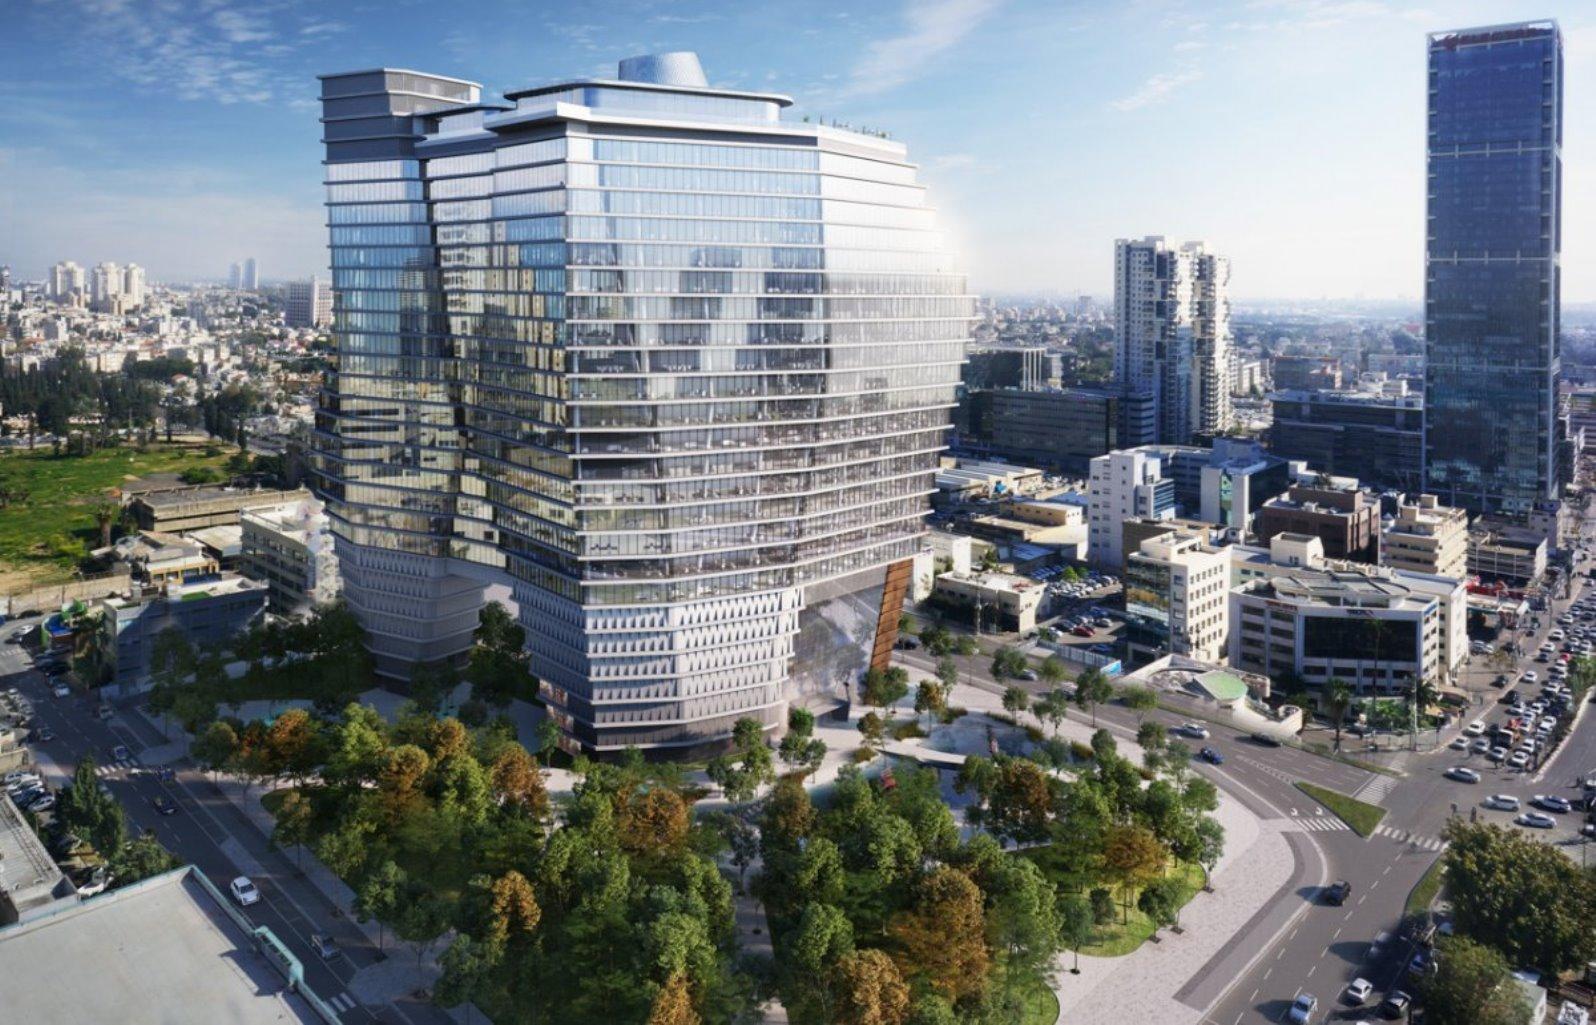 5 super-tall skyscrapers coming soon to Tel Aviv - ISRAEL21c